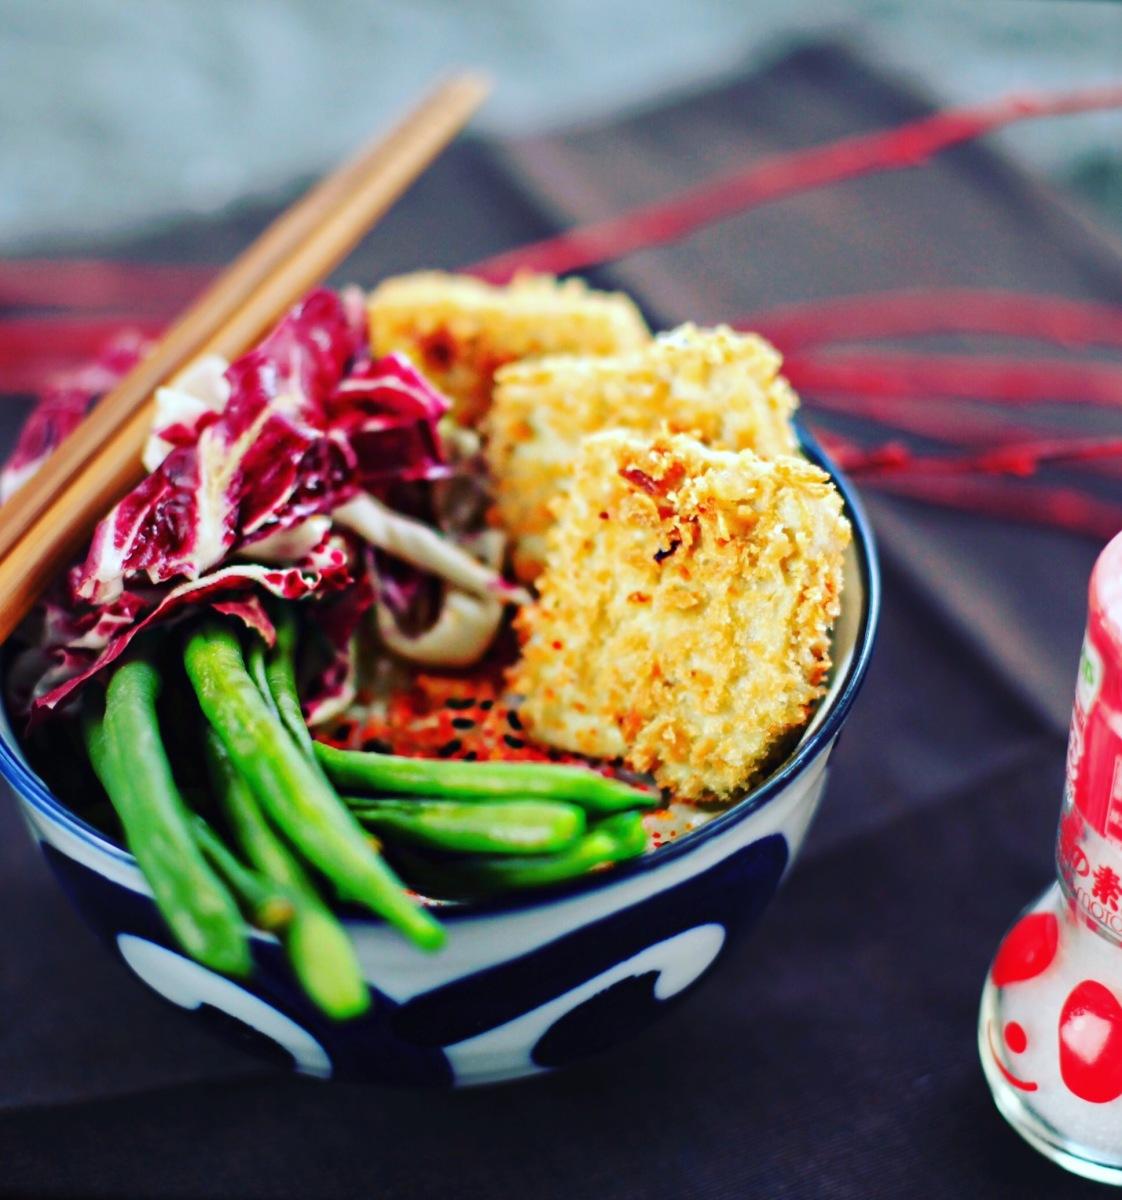 asiatische küche: die besten rezepte   brigitte.de. die besten ...